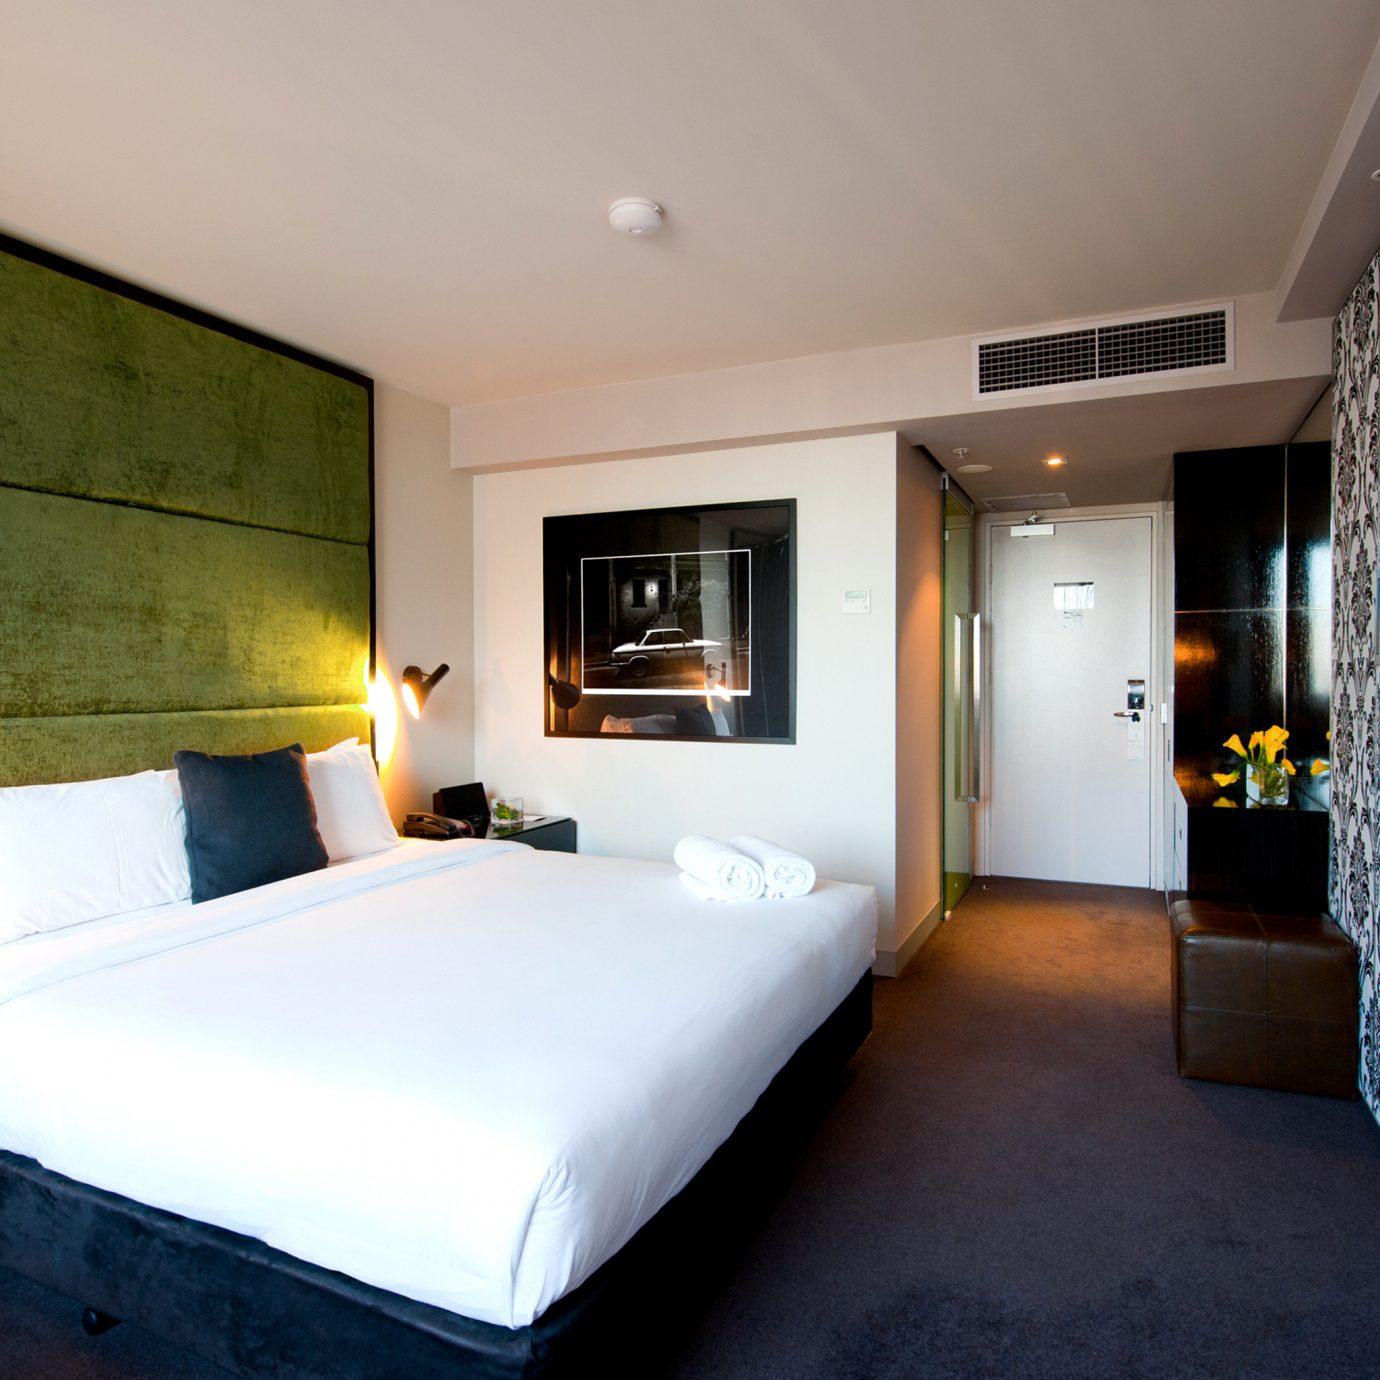 Bedroom Hip Luxury Modern Suite property home condominium cottage Villa living room